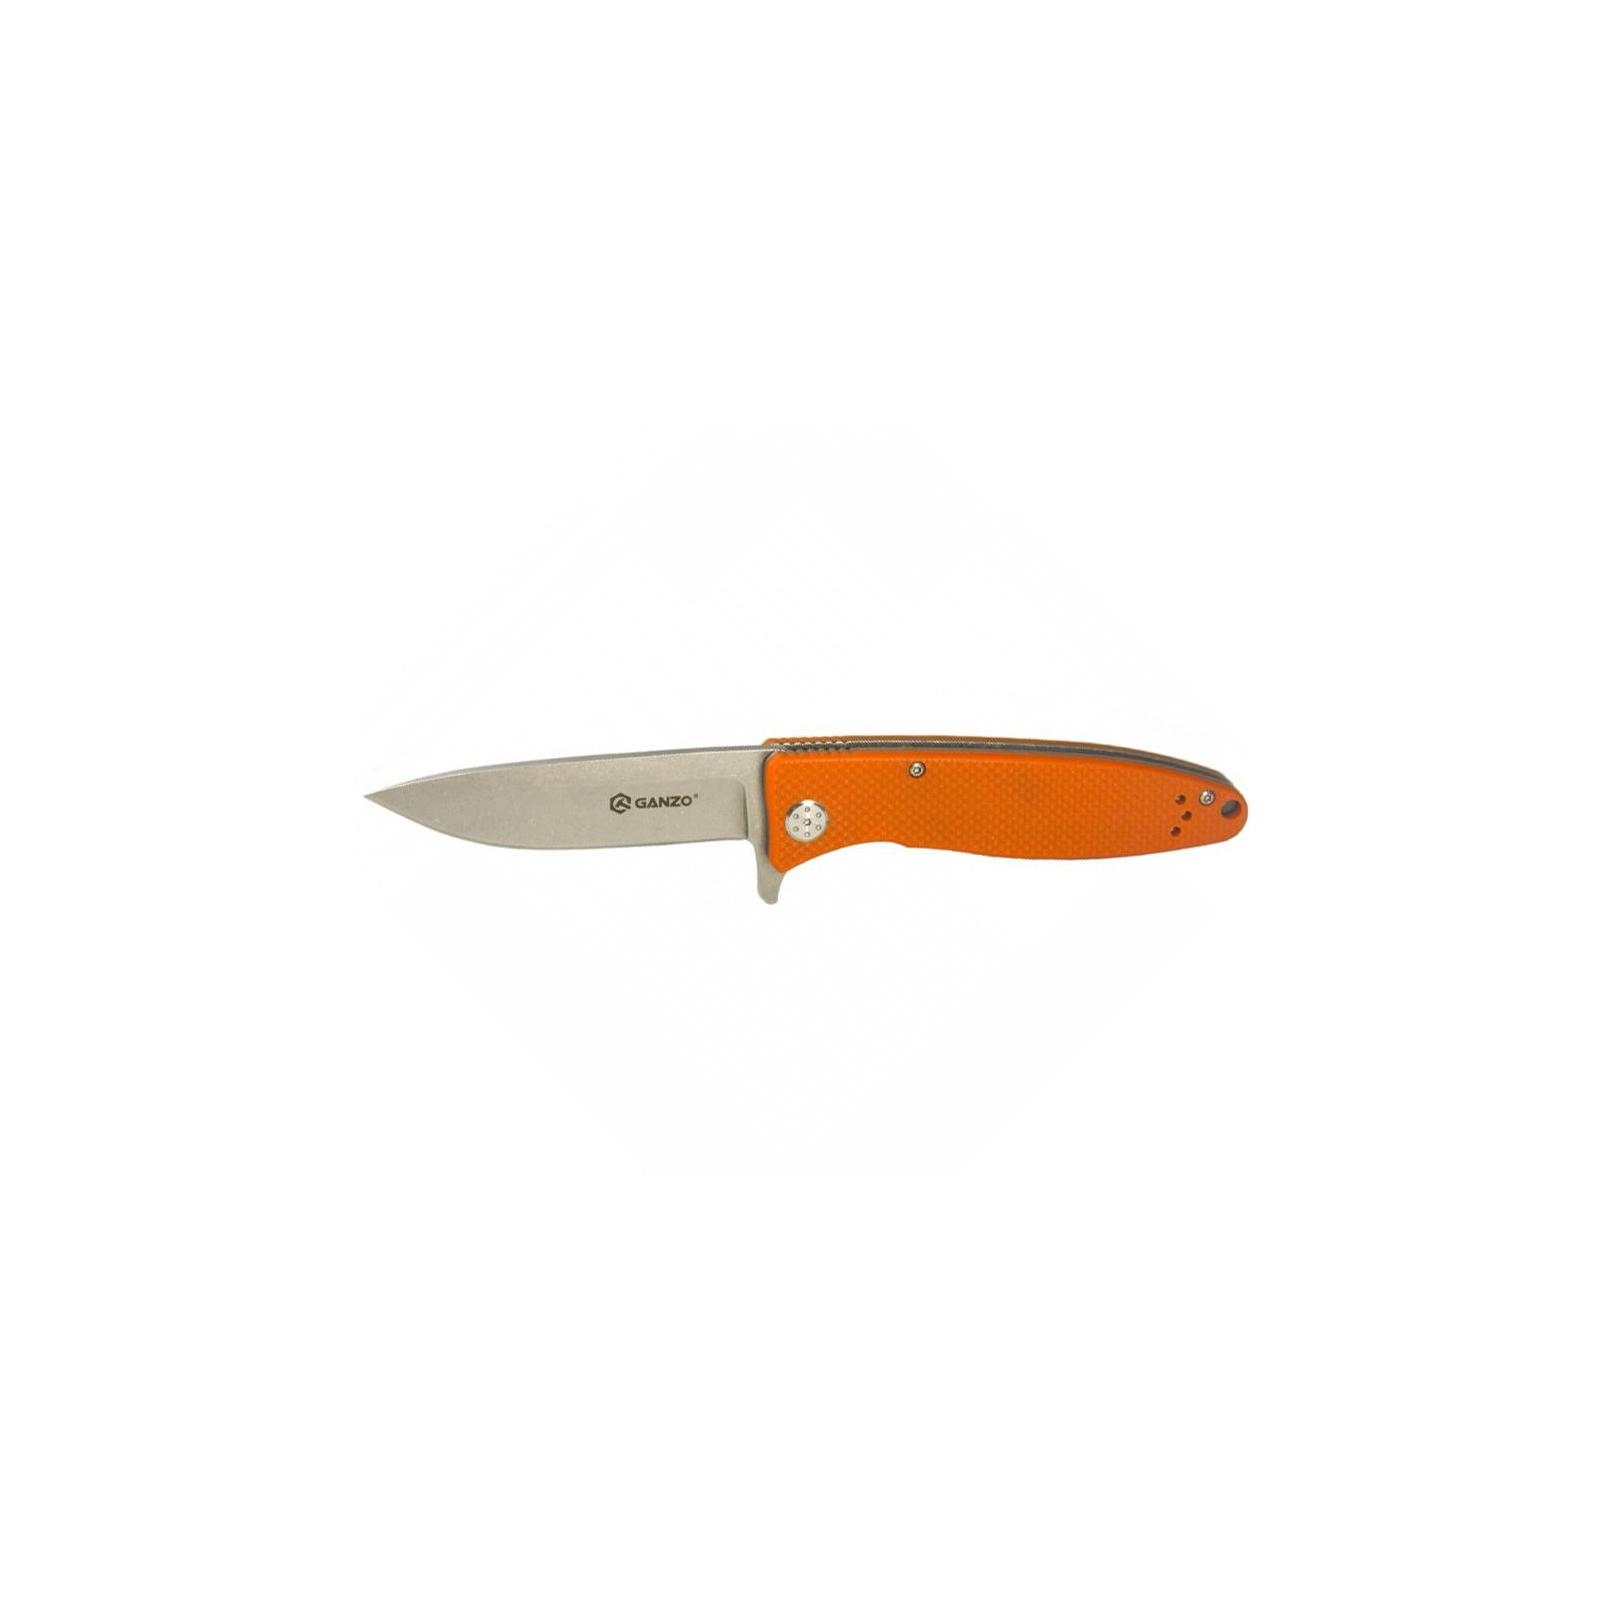 Нож Ganzo G728-OR, оранжевый (G728-OR)